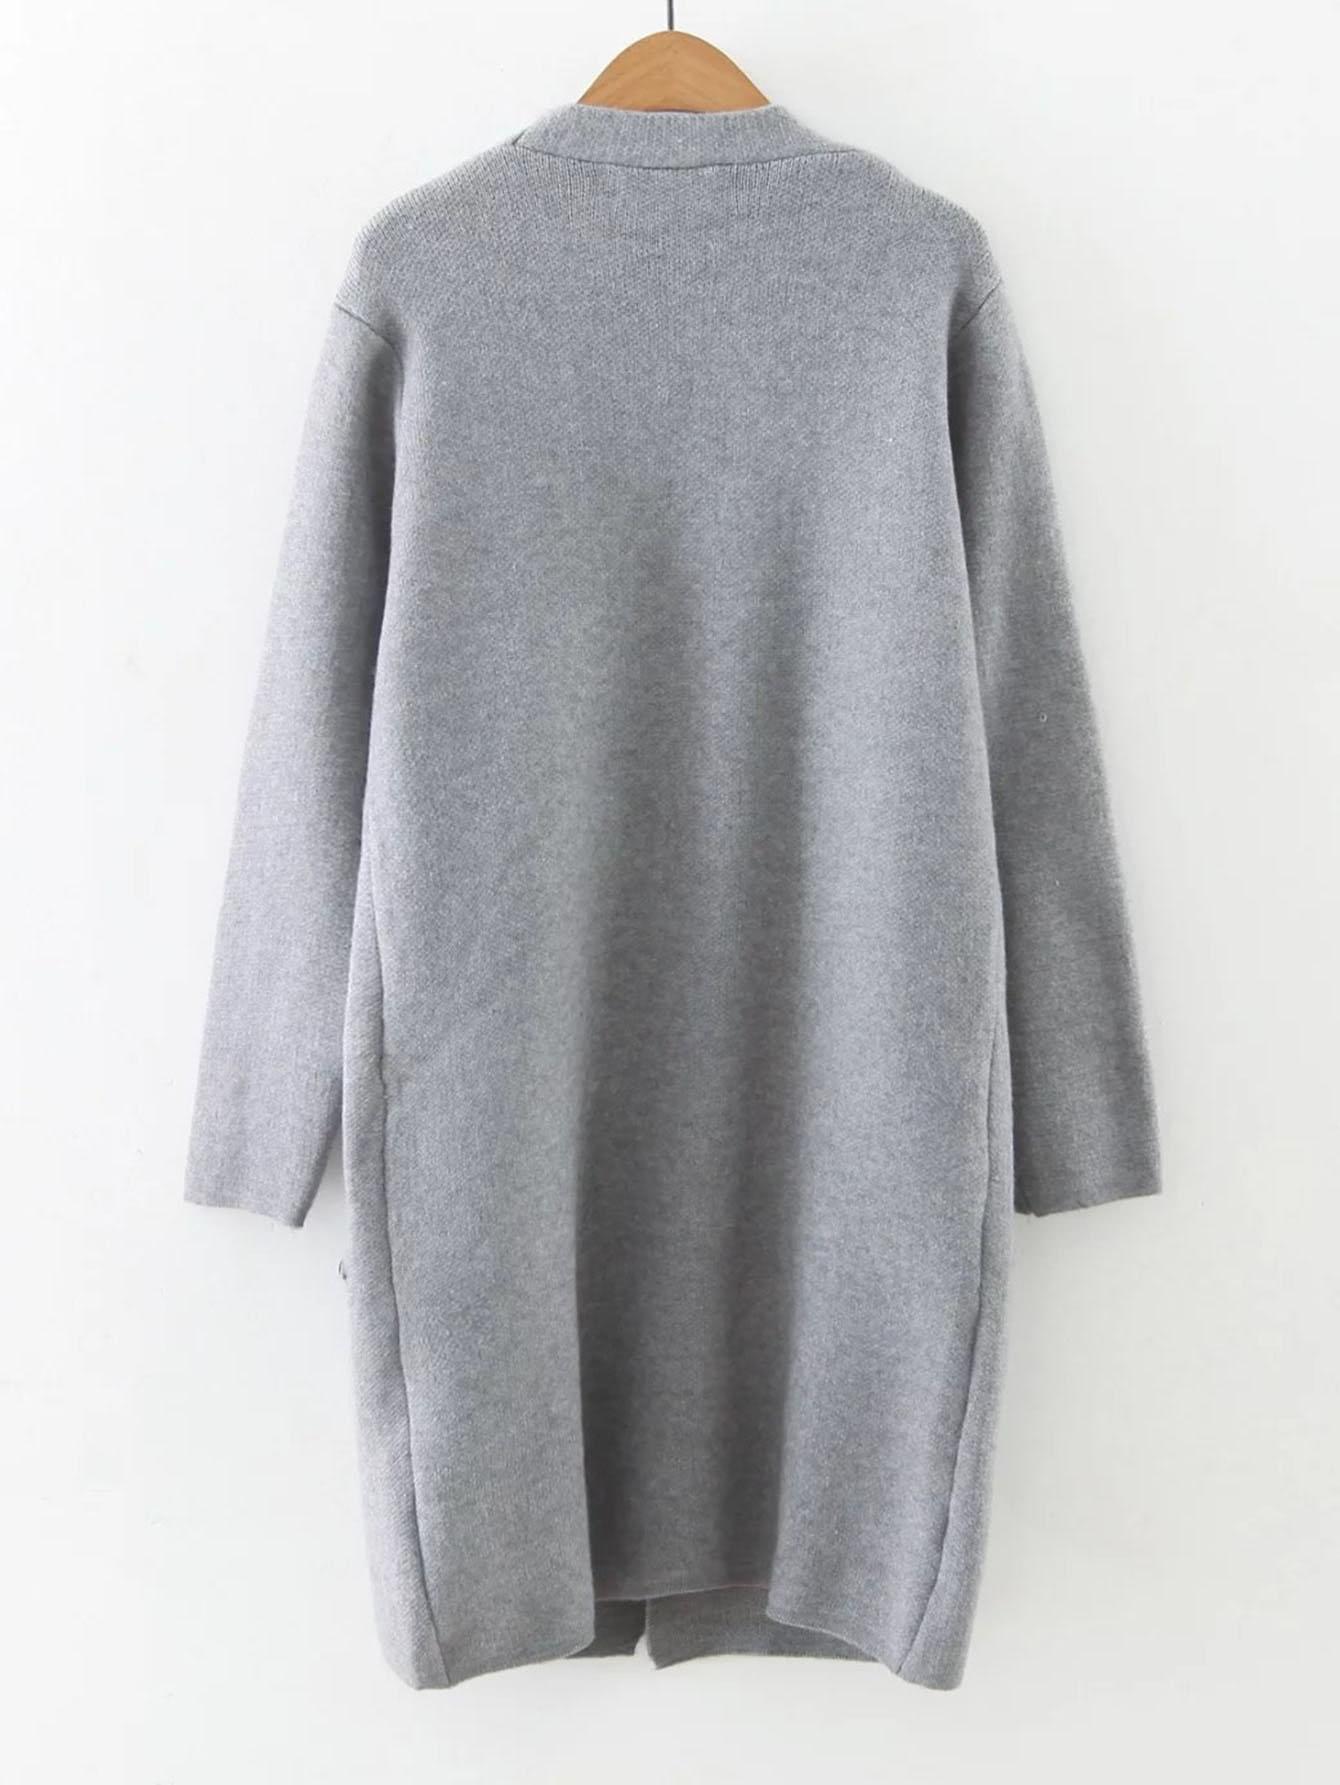 Faux Fur Embellished Pocket Long Line Cardigan -SheIn(Sheinside)